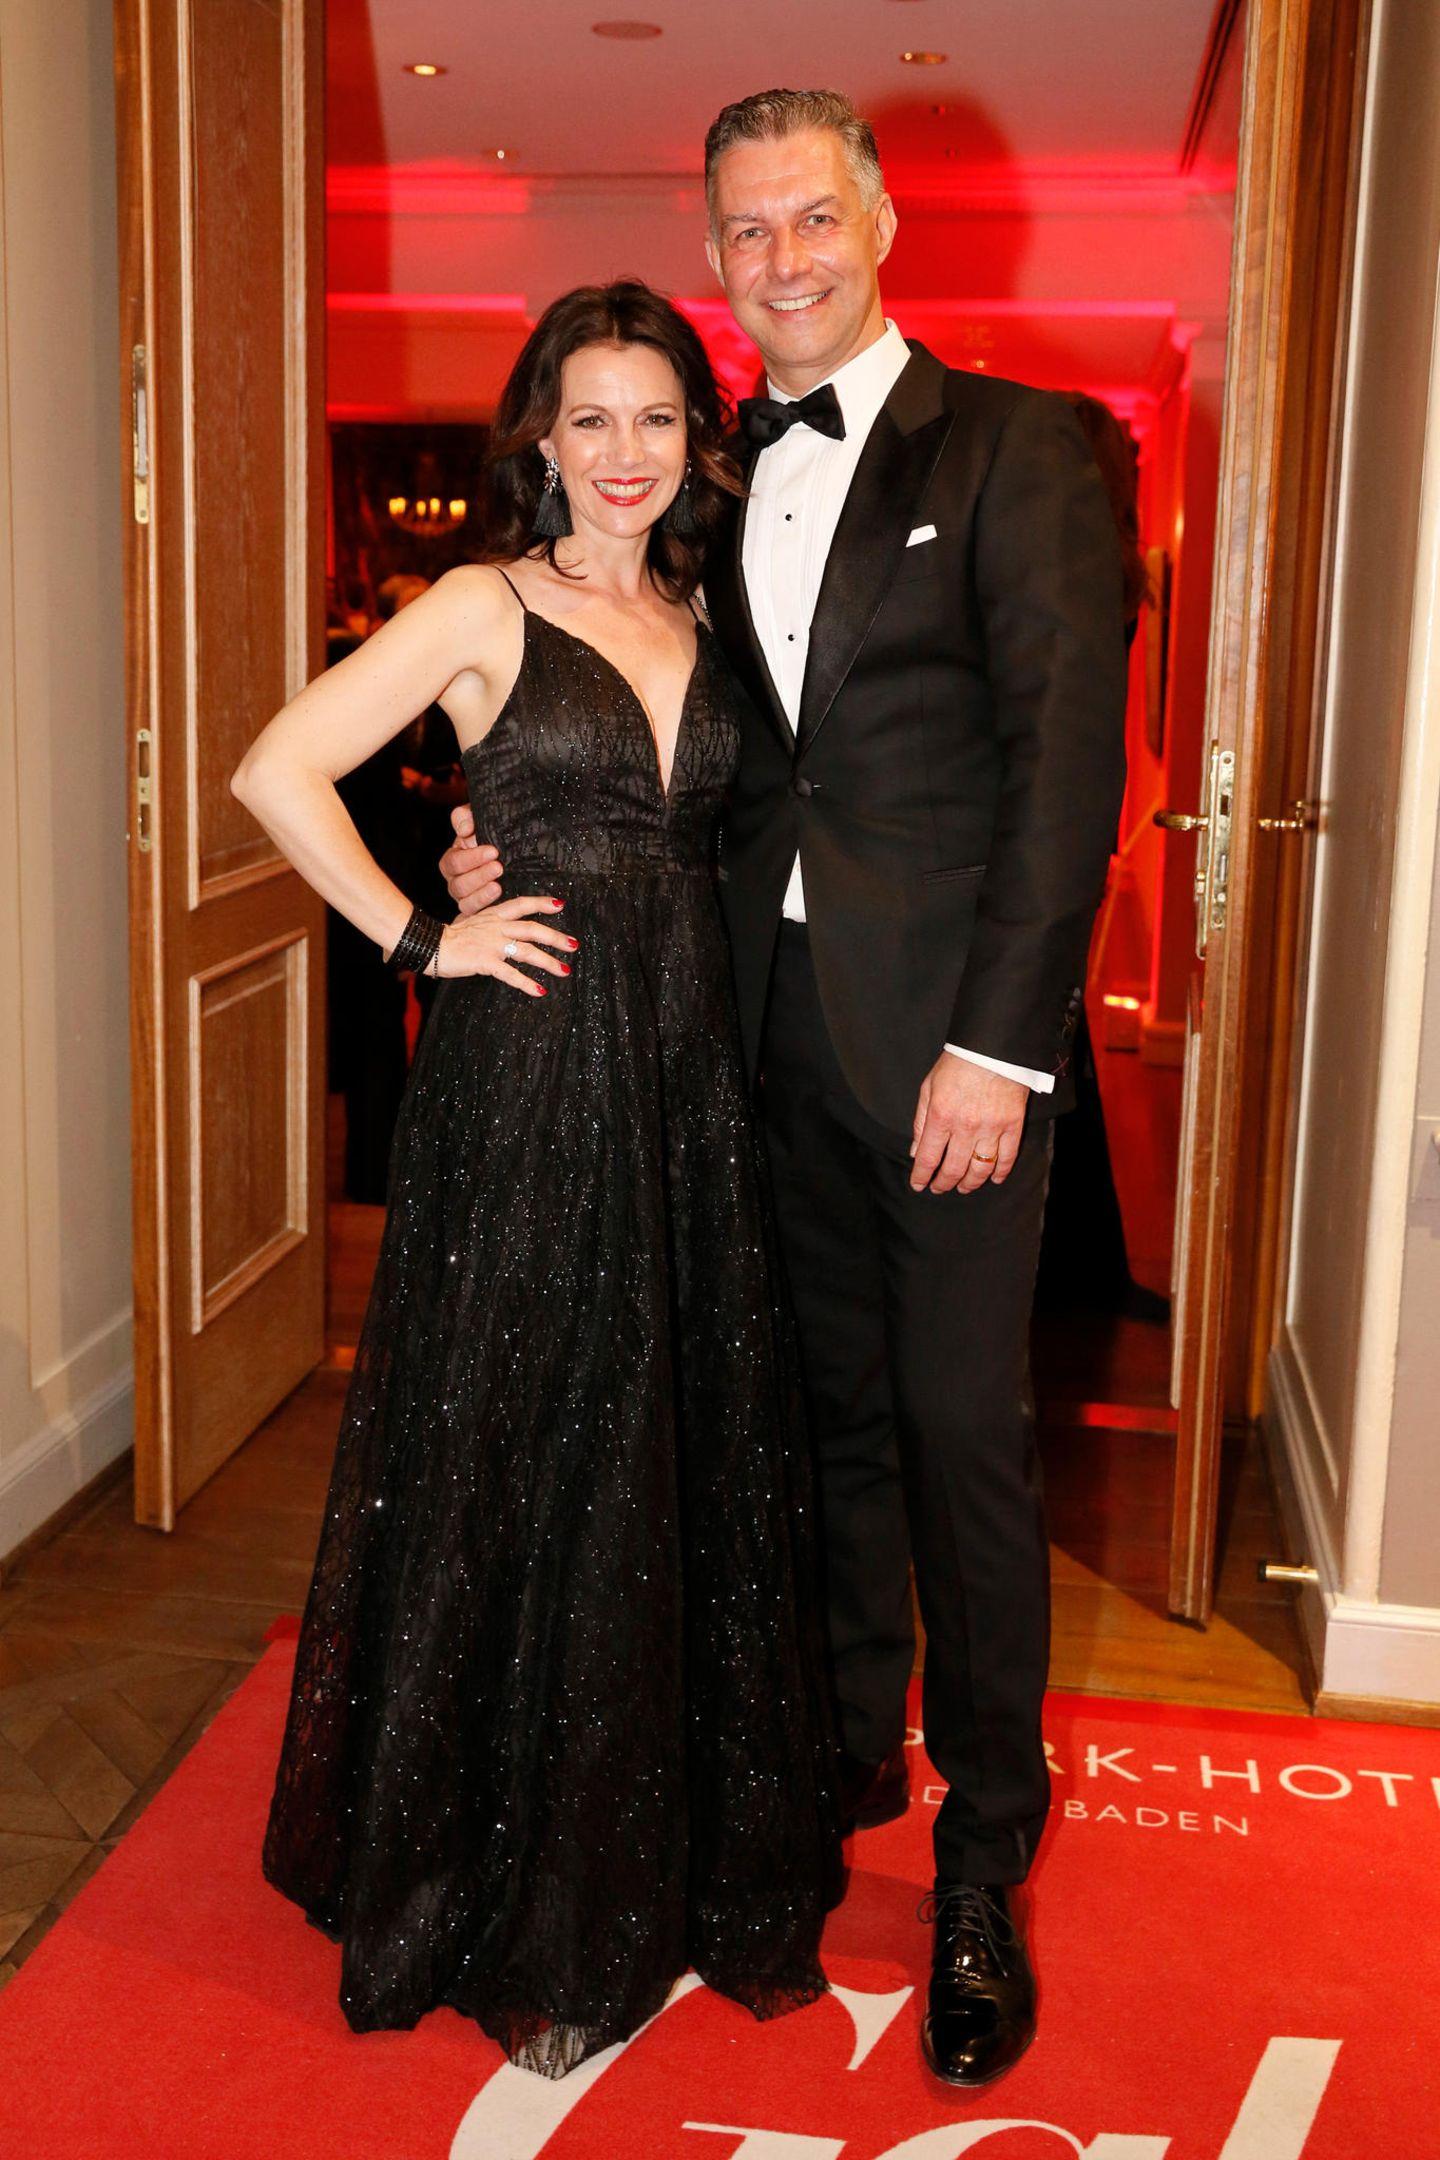 Michael Schummert (Dr. Babor) und Carola Schummert